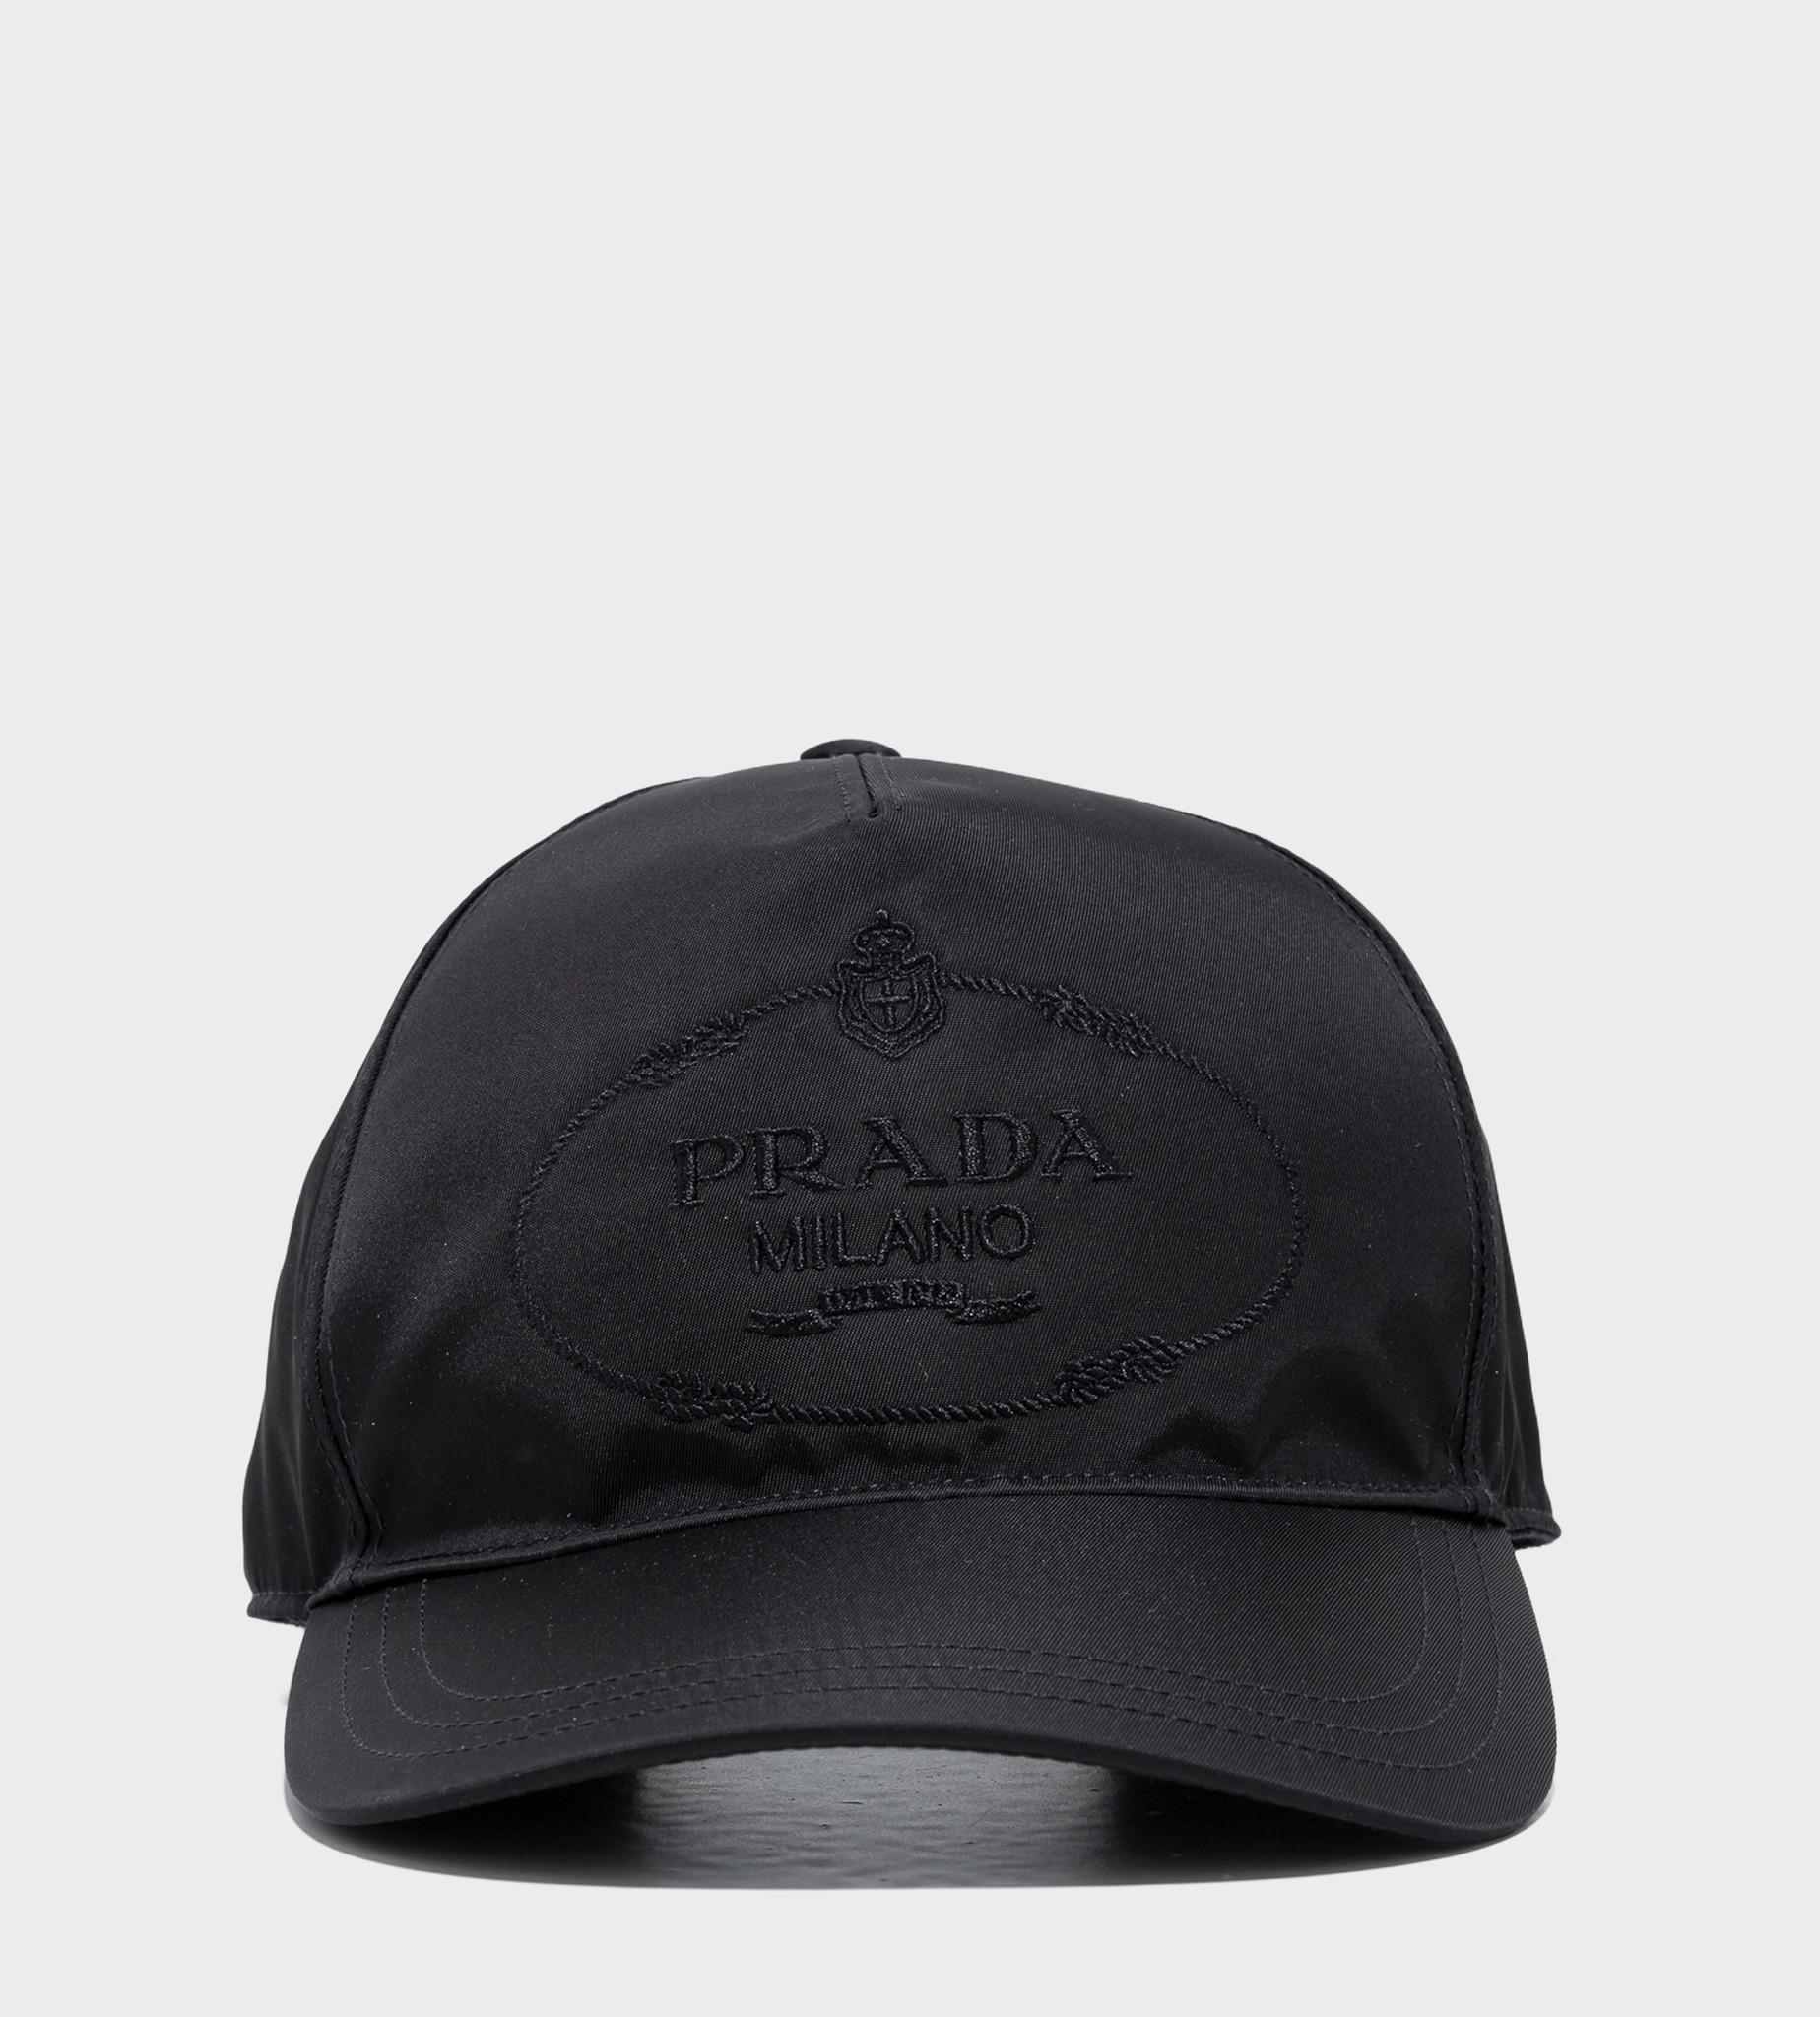 PRADA Embroidered Logo Baseball Cap Black